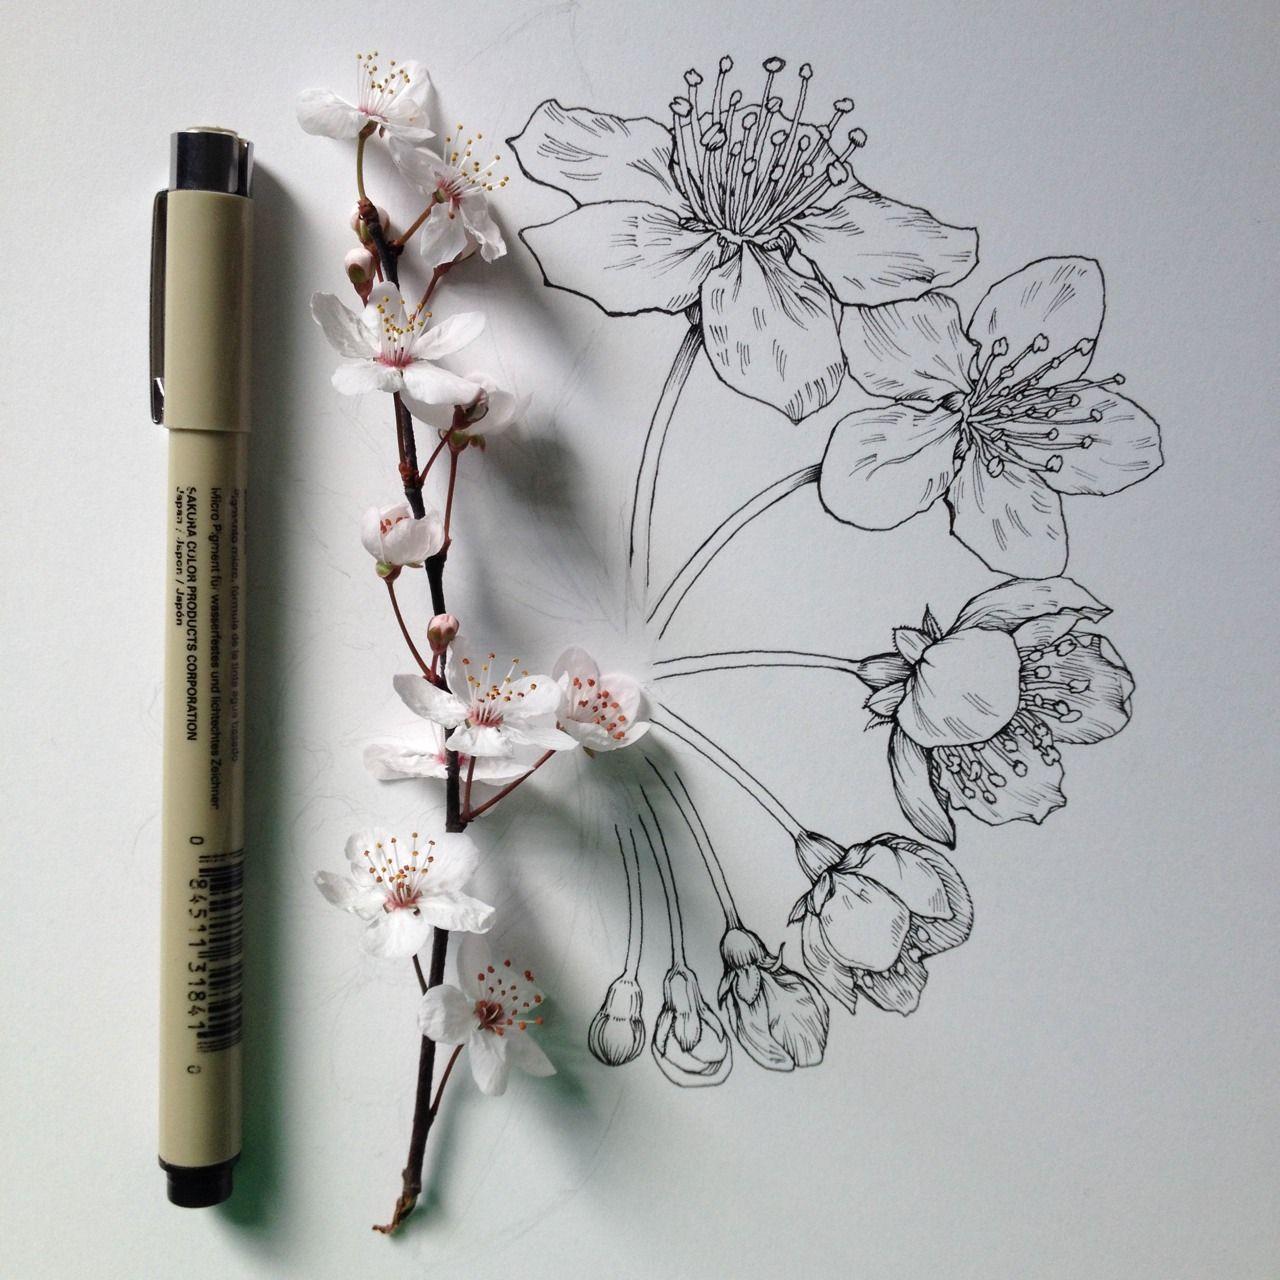 Blooming Flowers Gotsomelovelytattoos Tumblr Com S Pinterest